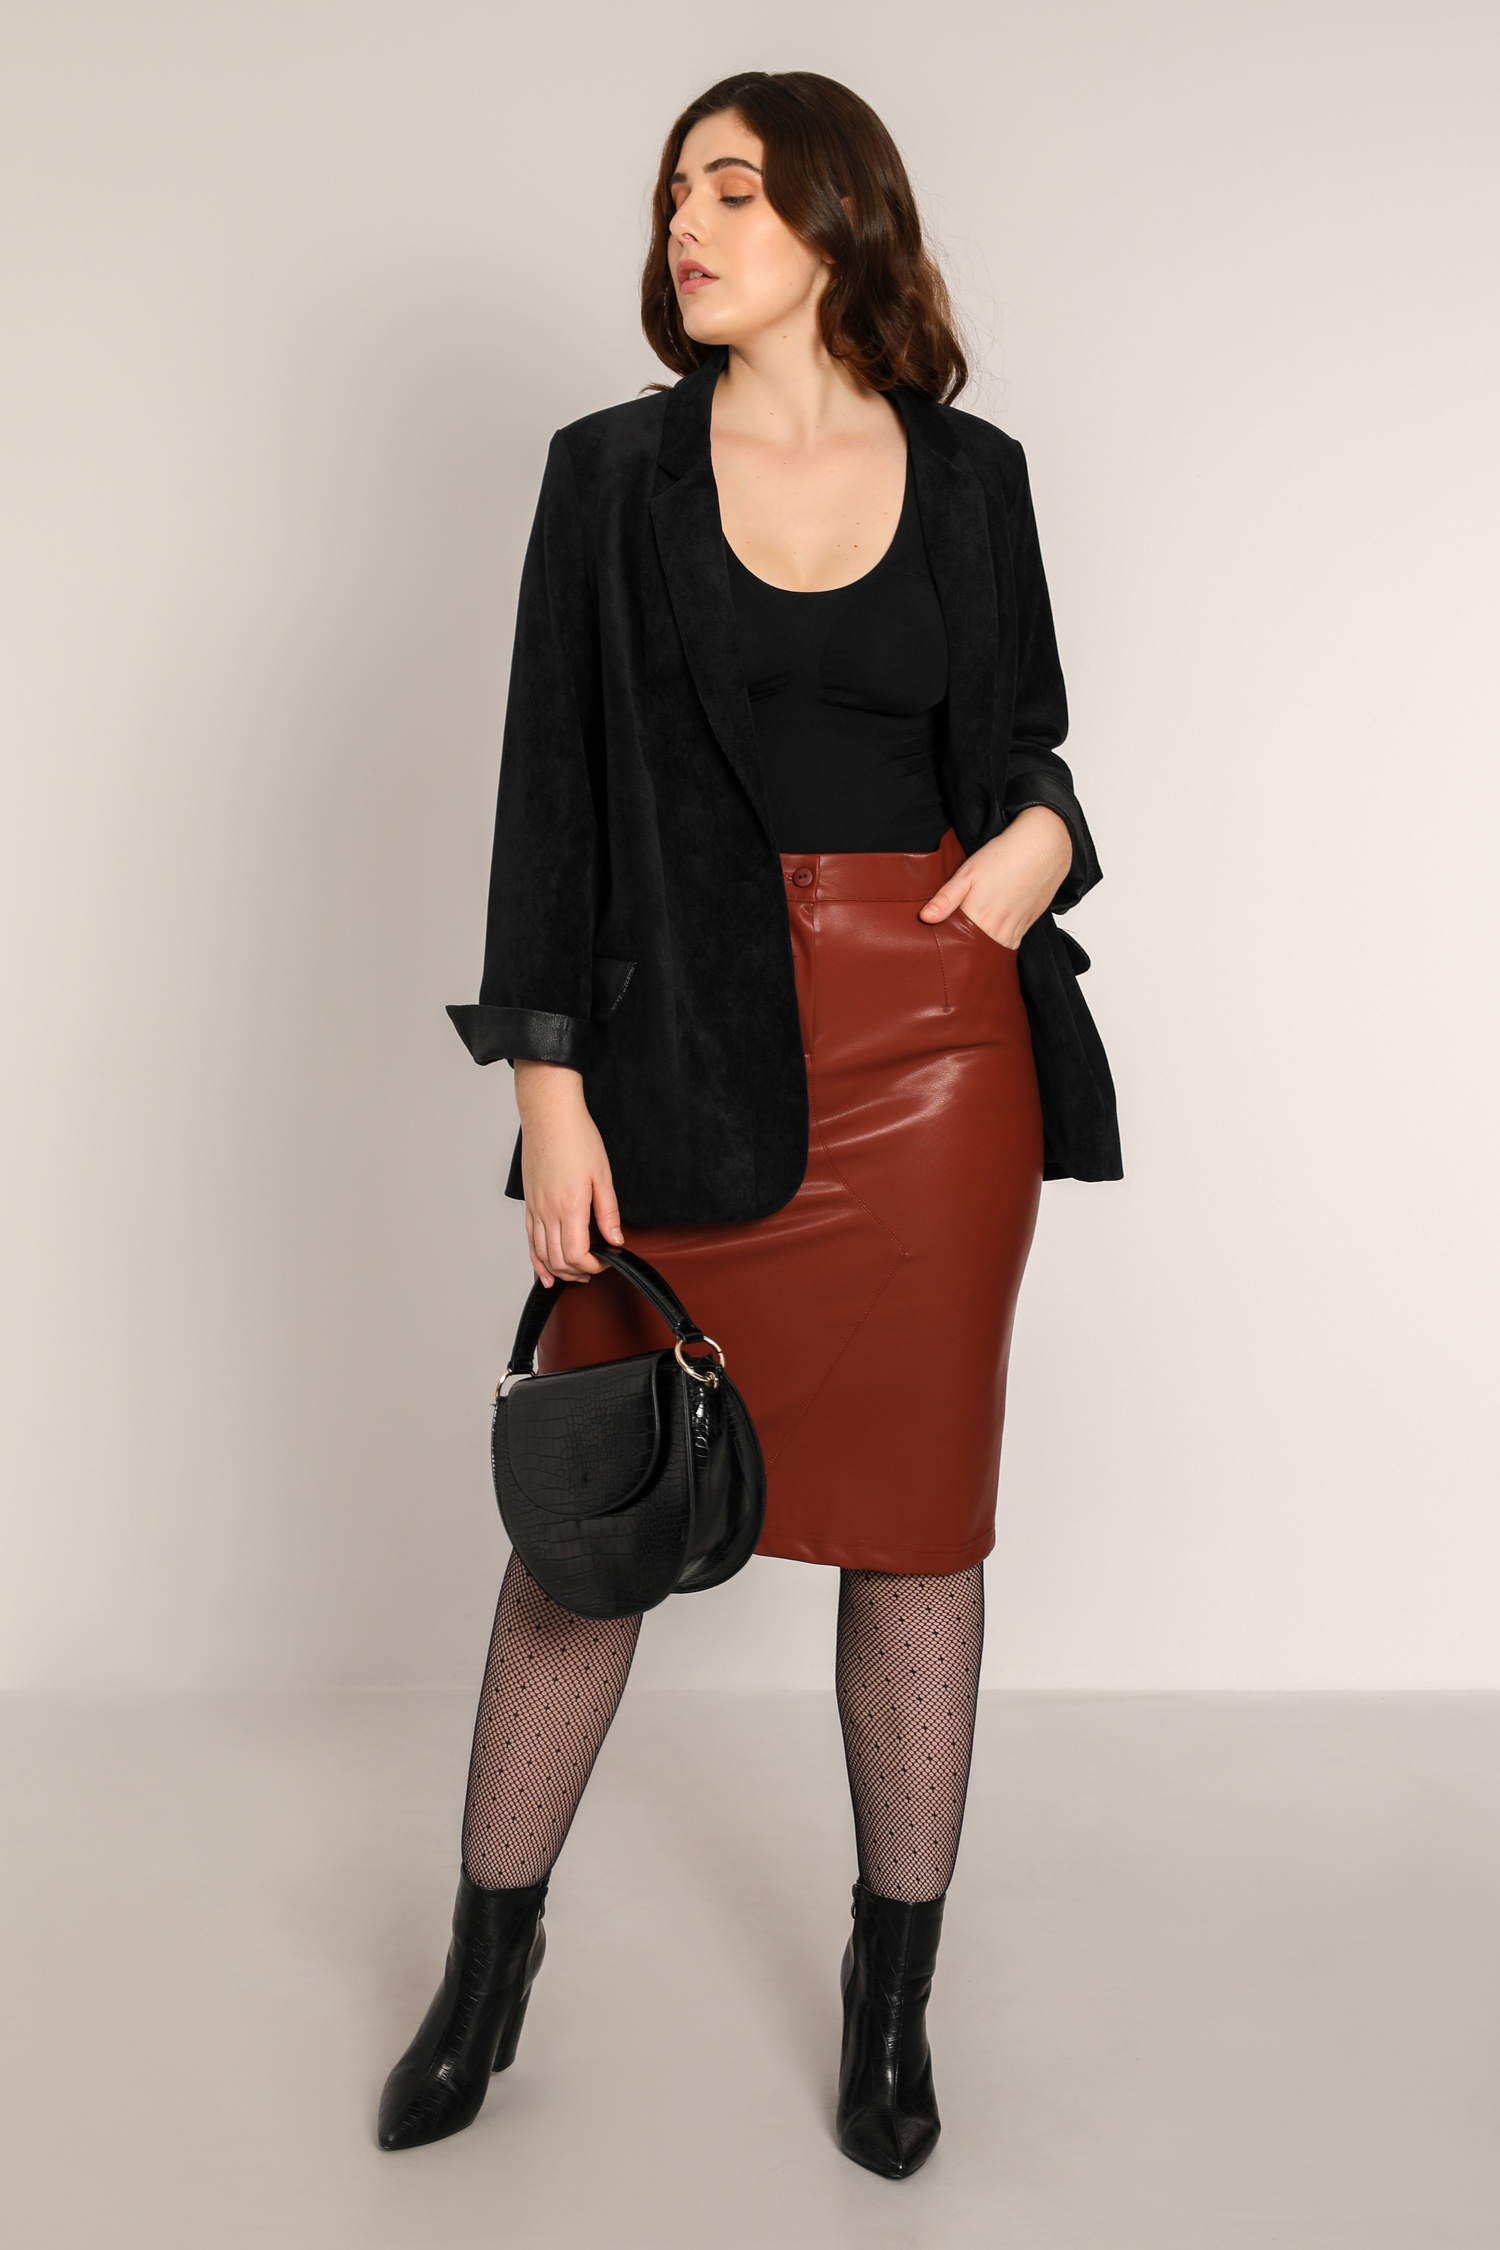 Vegan leather pencil skirt